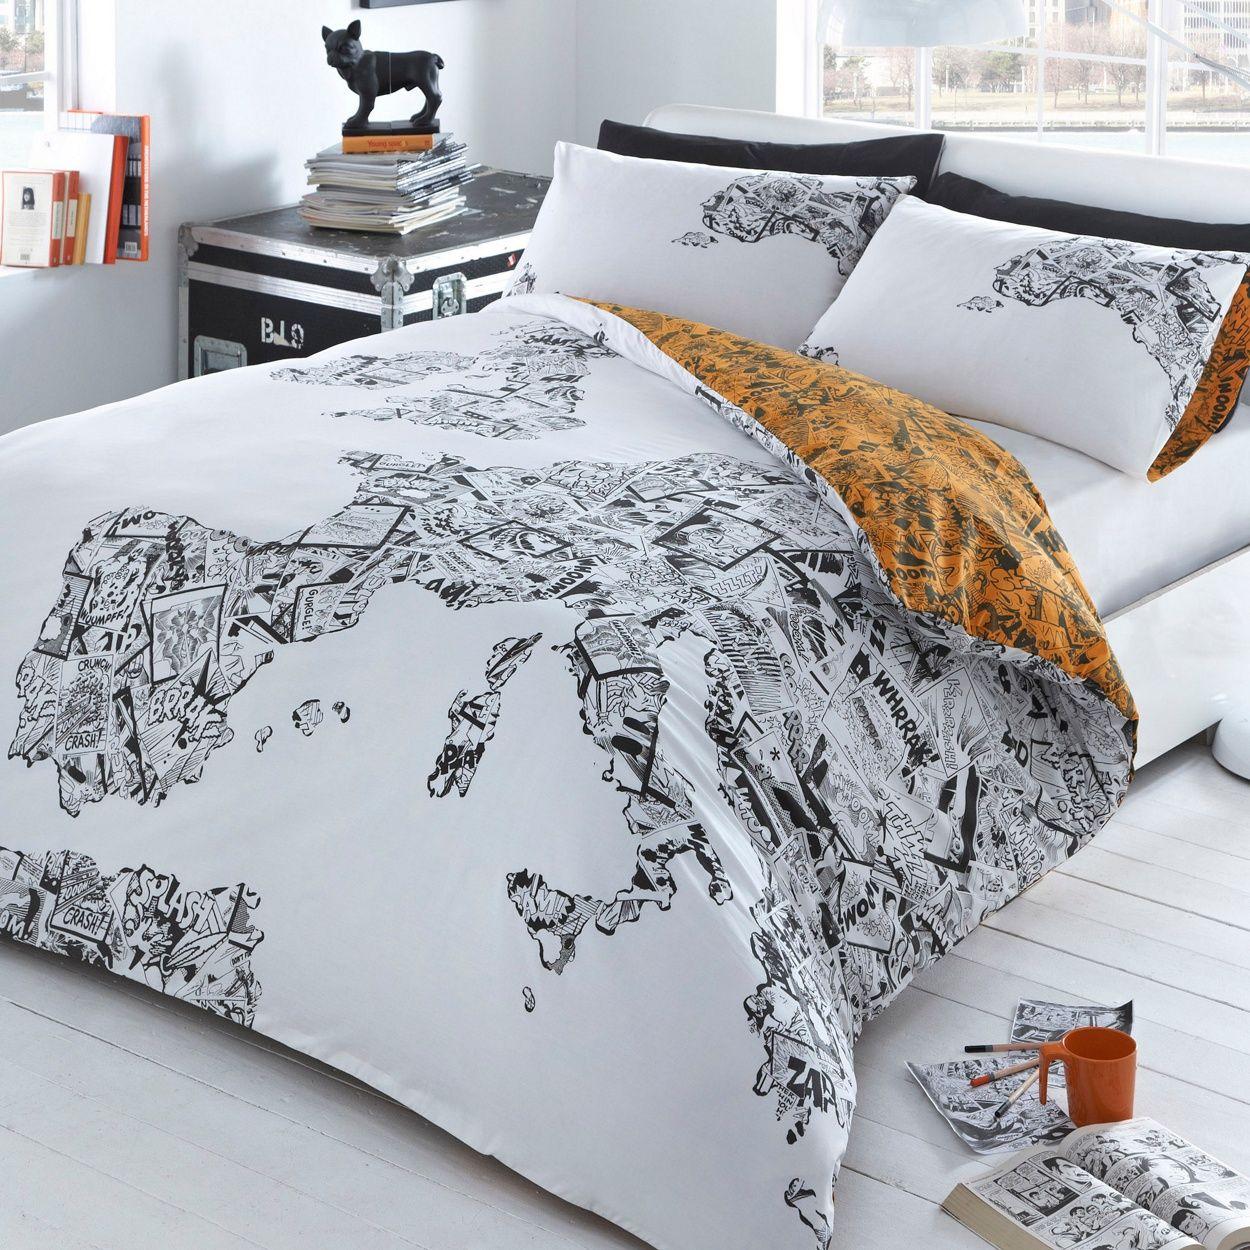 Ben de lisi white comic map bedding set at debenhams my ben de lisi white comic map bedding set at debenhams gumiabroncs Choice Image